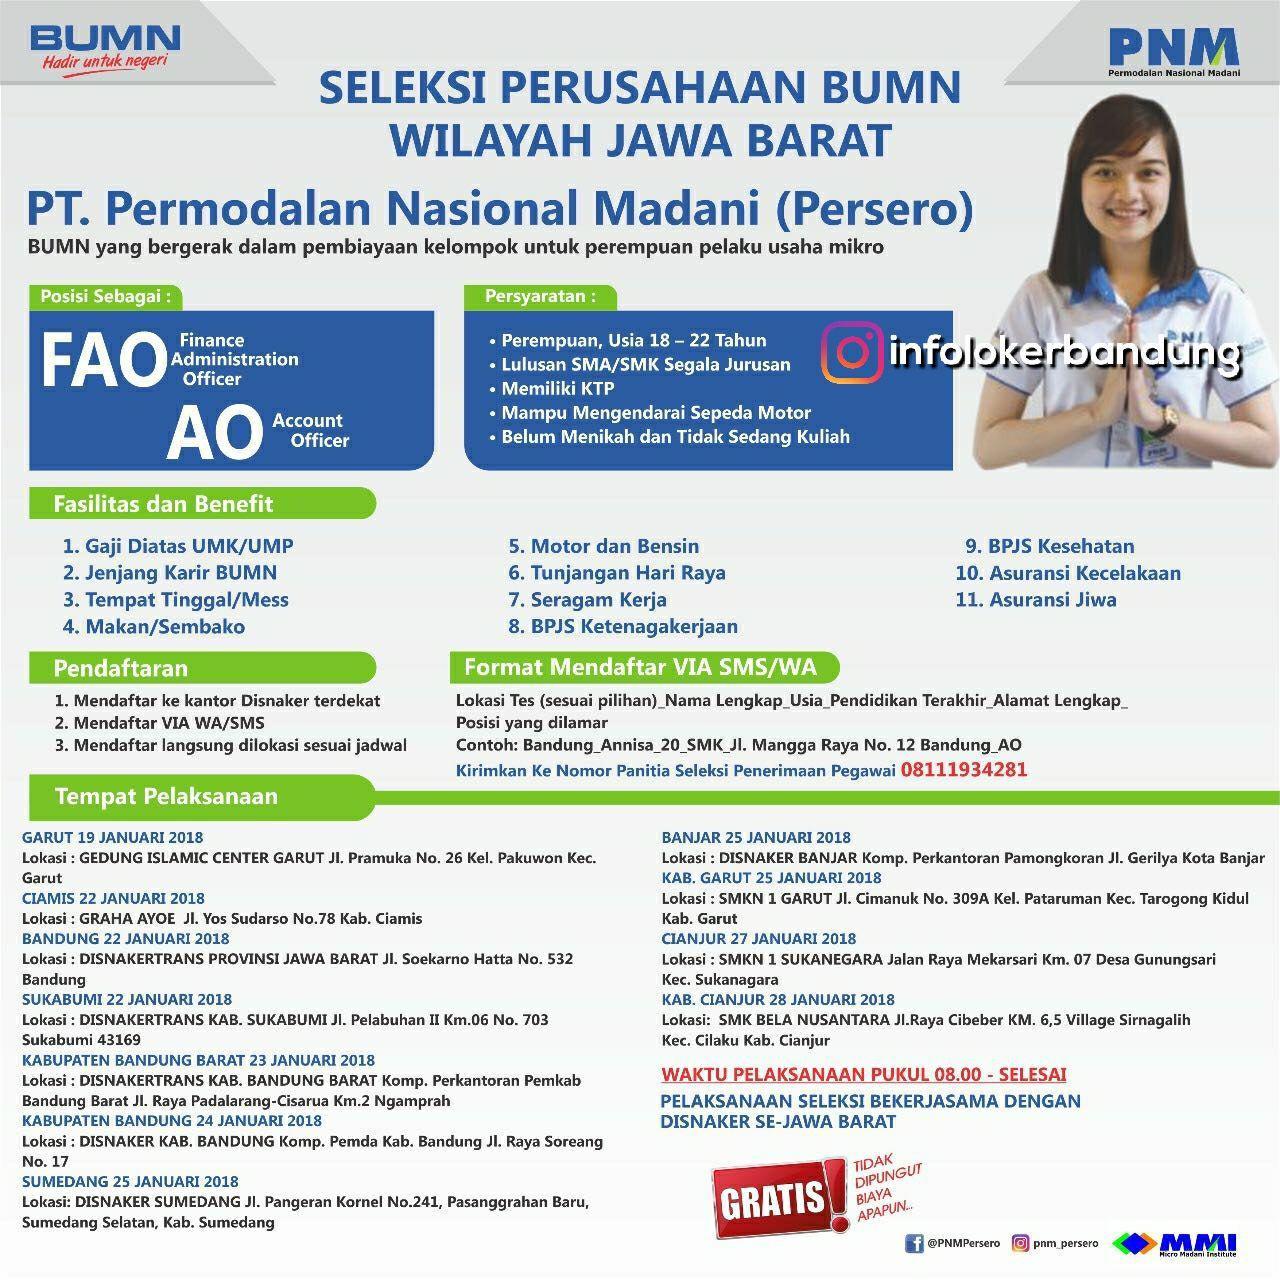 Lowongan Kerja PT. Permodalan Nasional Madani ( Persero) Januari 2018